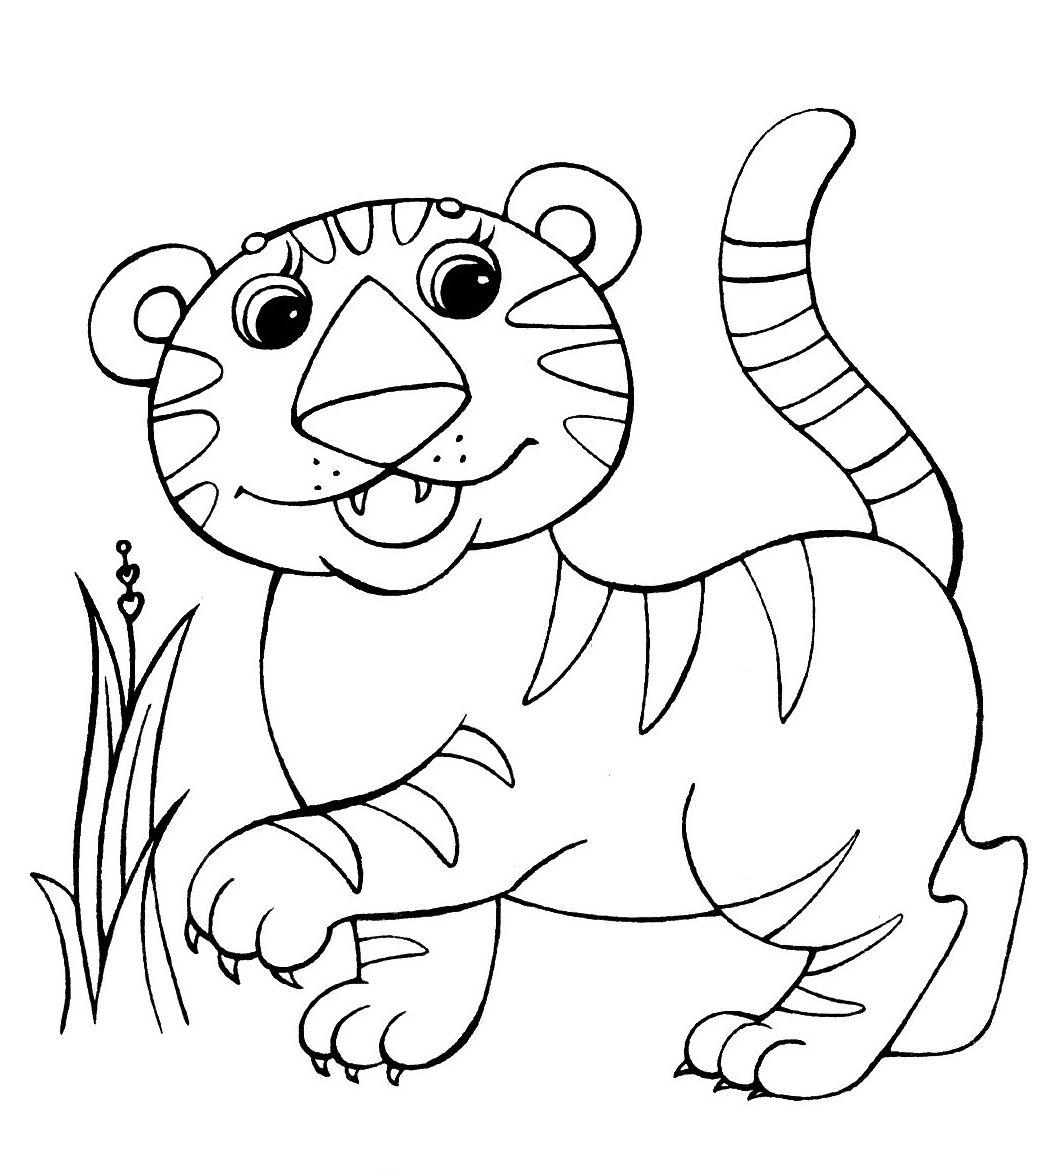 Раскраски тигрята распечатать